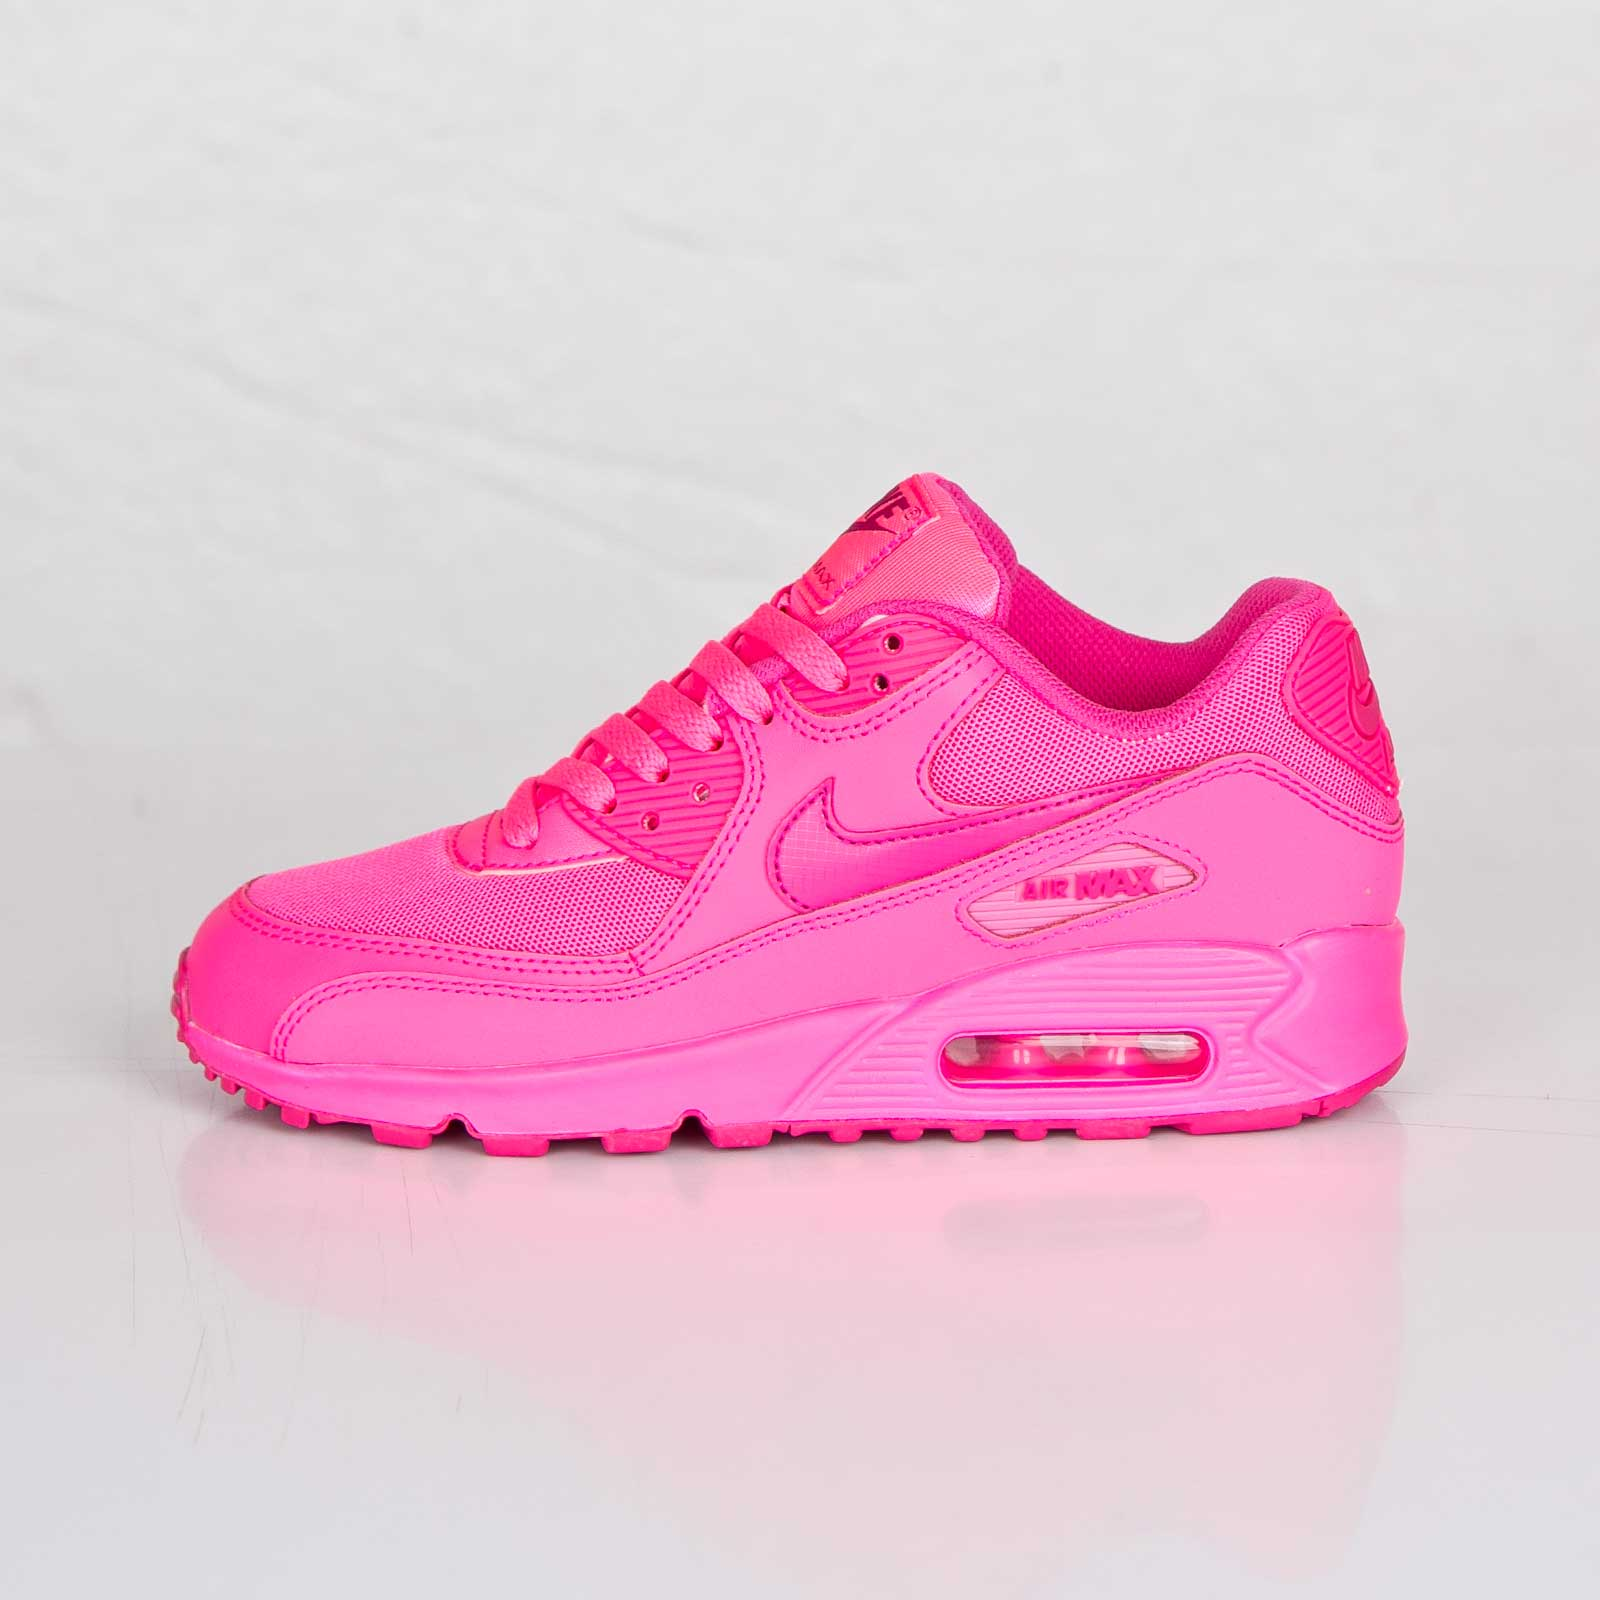 separation shoes f452b 769b1 Nike Air Max 90 2007 (GS) - 7. Close